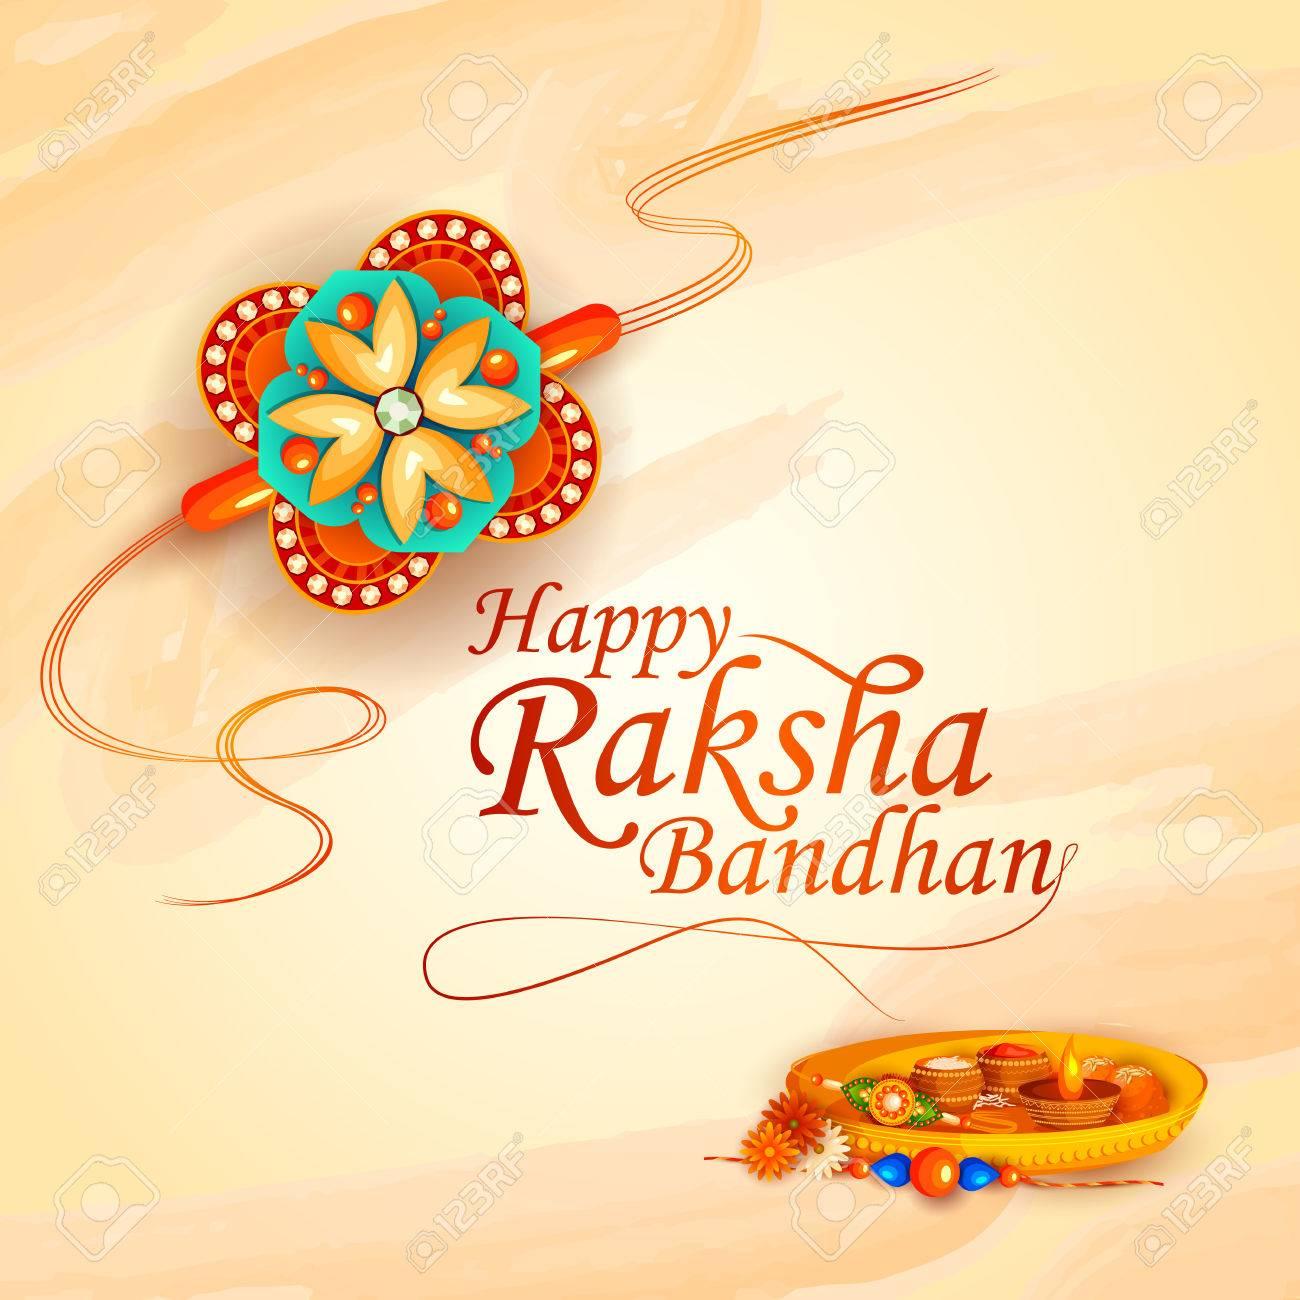 vector illustration of decorated rakhi for Indian festival Raksha Bandhan - 81571849